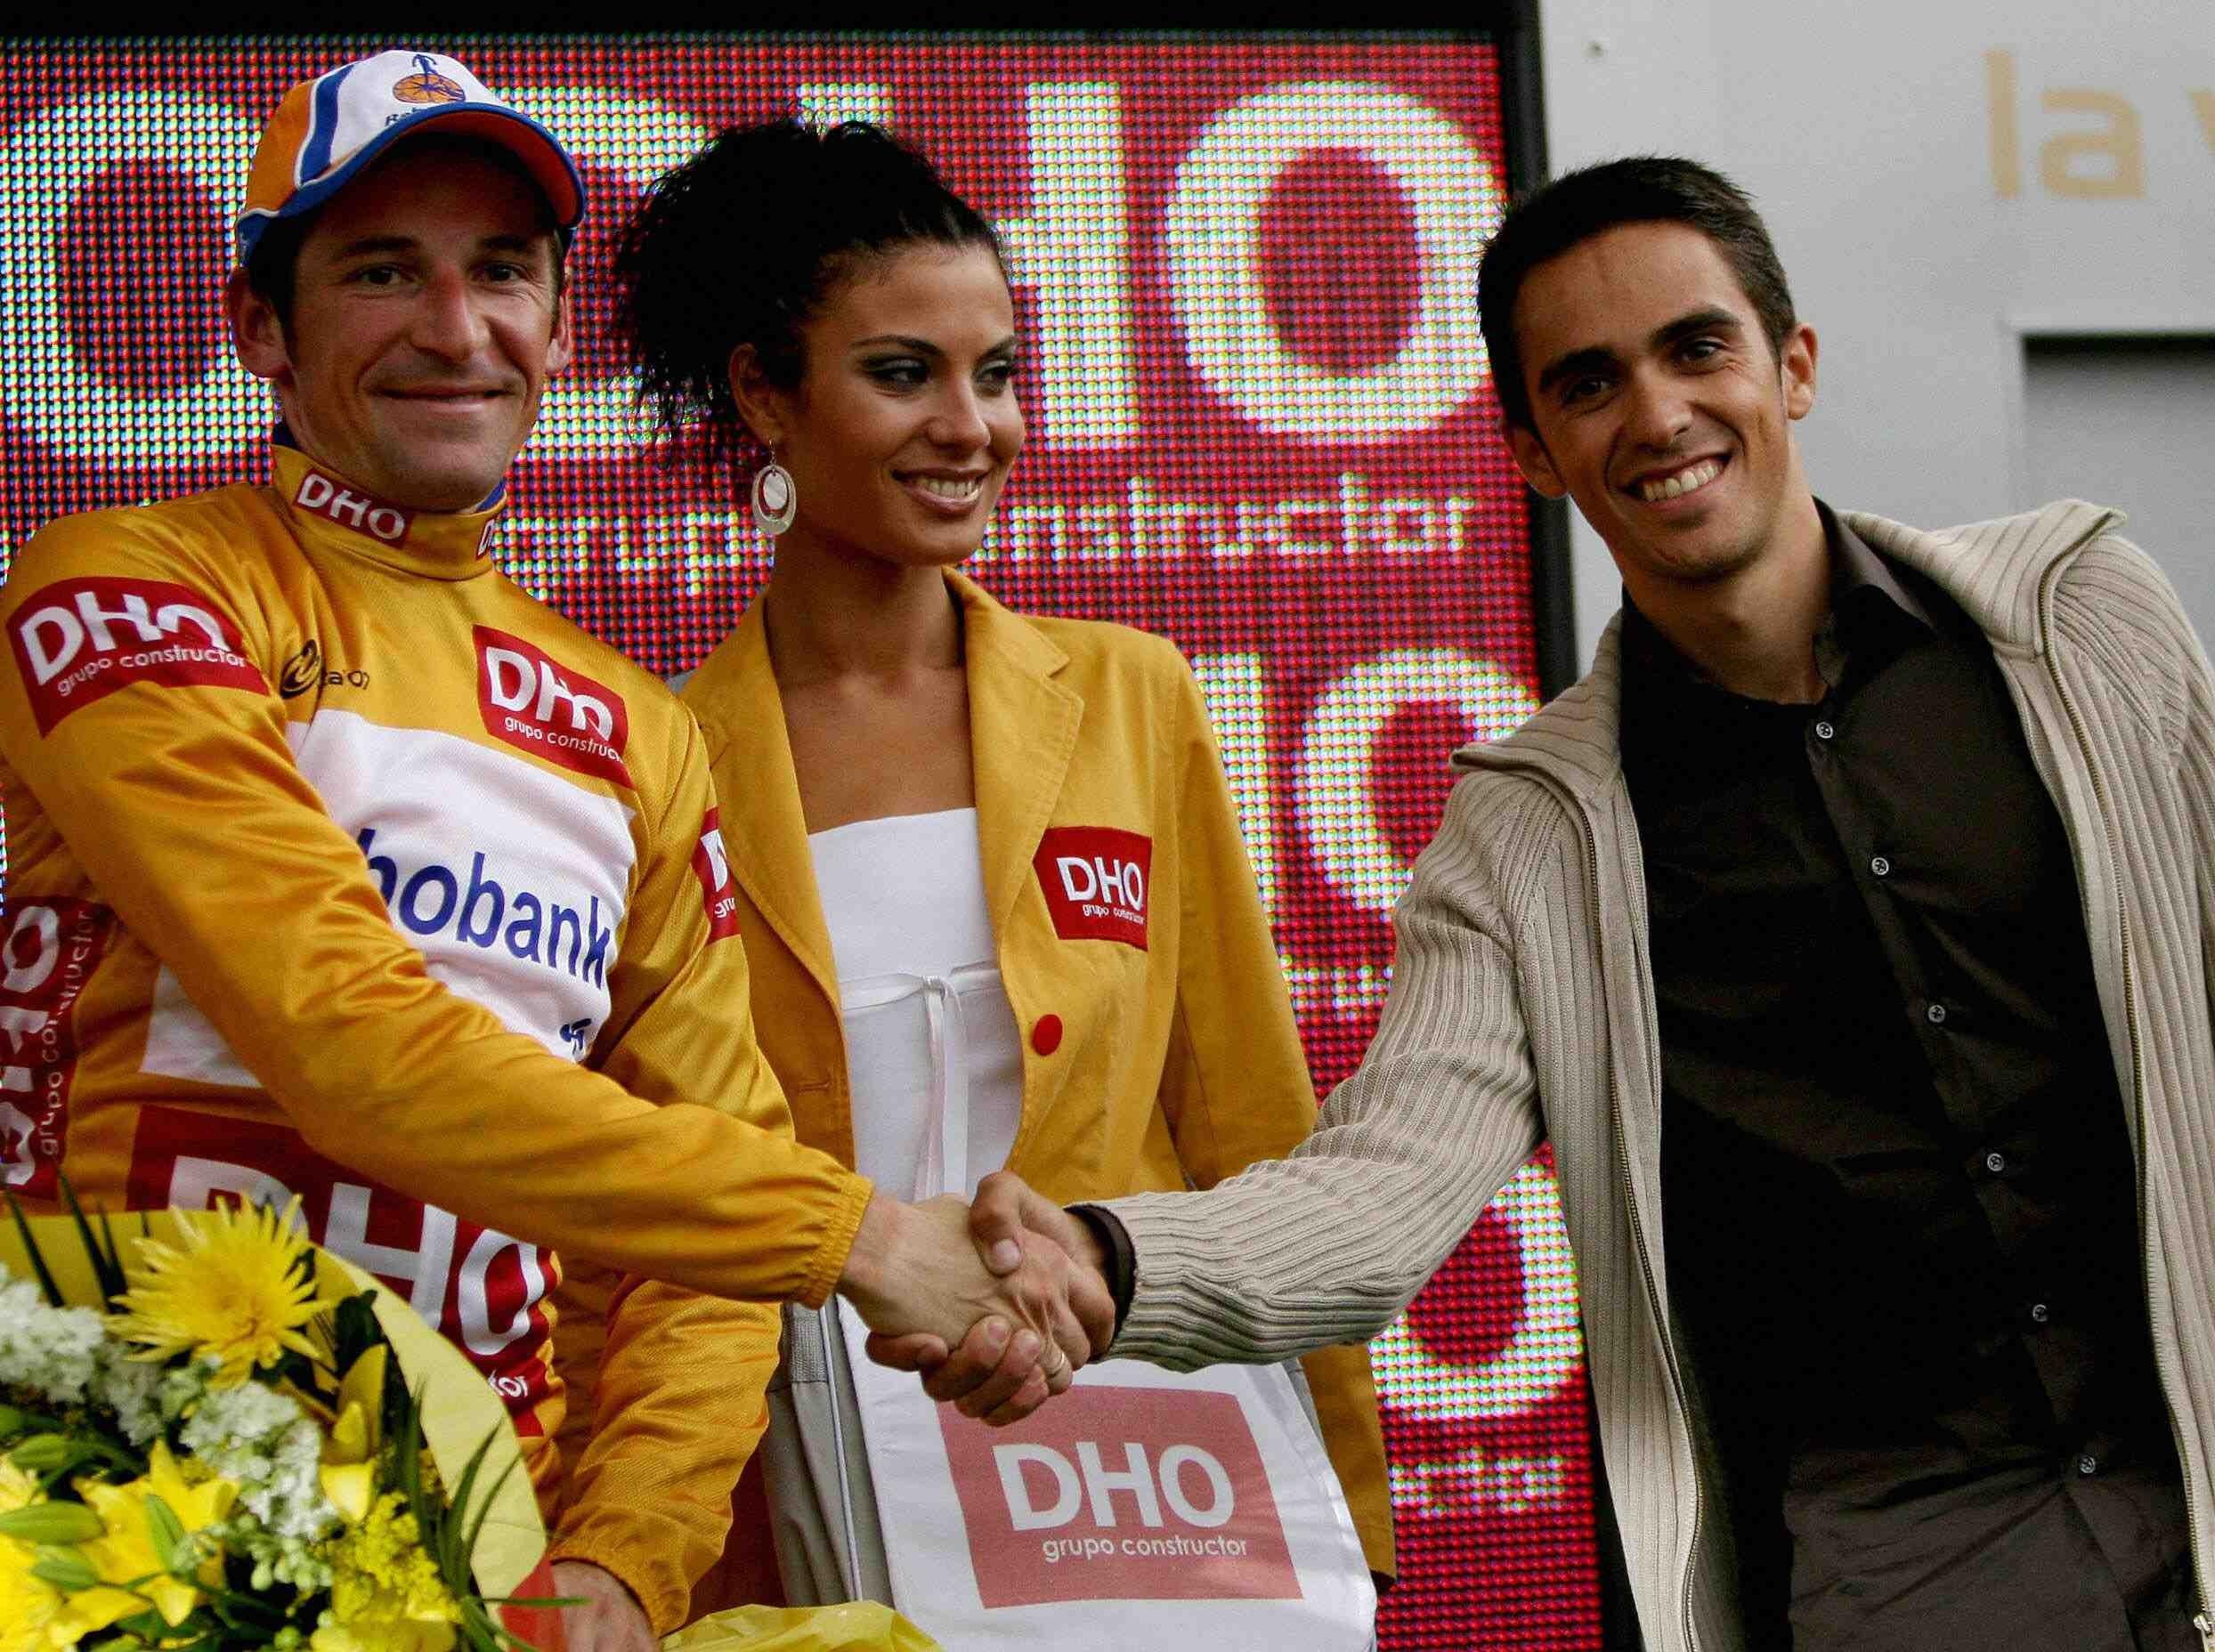 Vuelta winner Denis Menchov (L) receives a transfer of Tour-winning power from Alberto Contador.